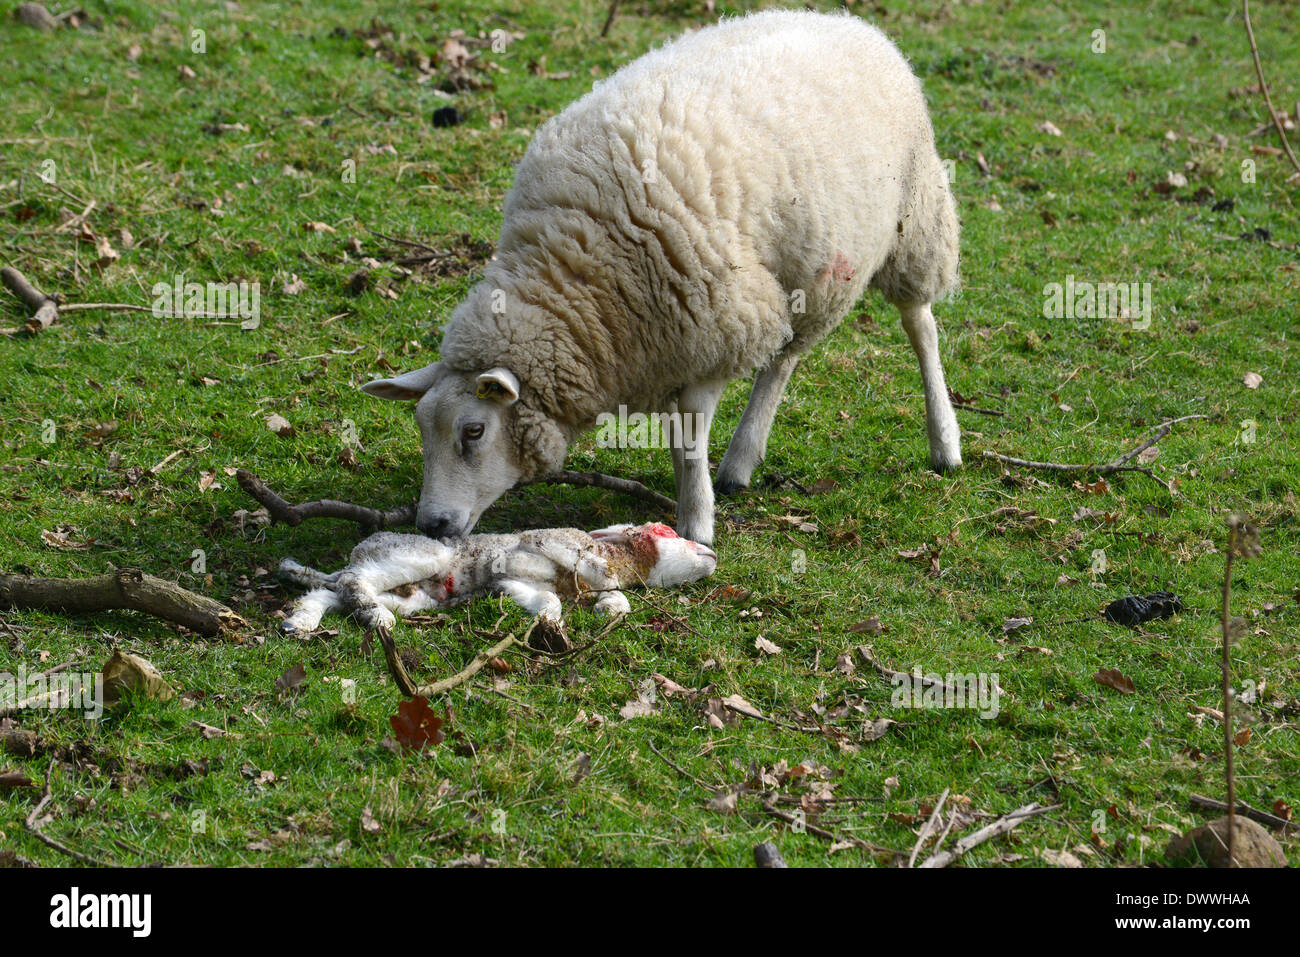 female sheep ewe standing by her dead baby lamb uk stock photo